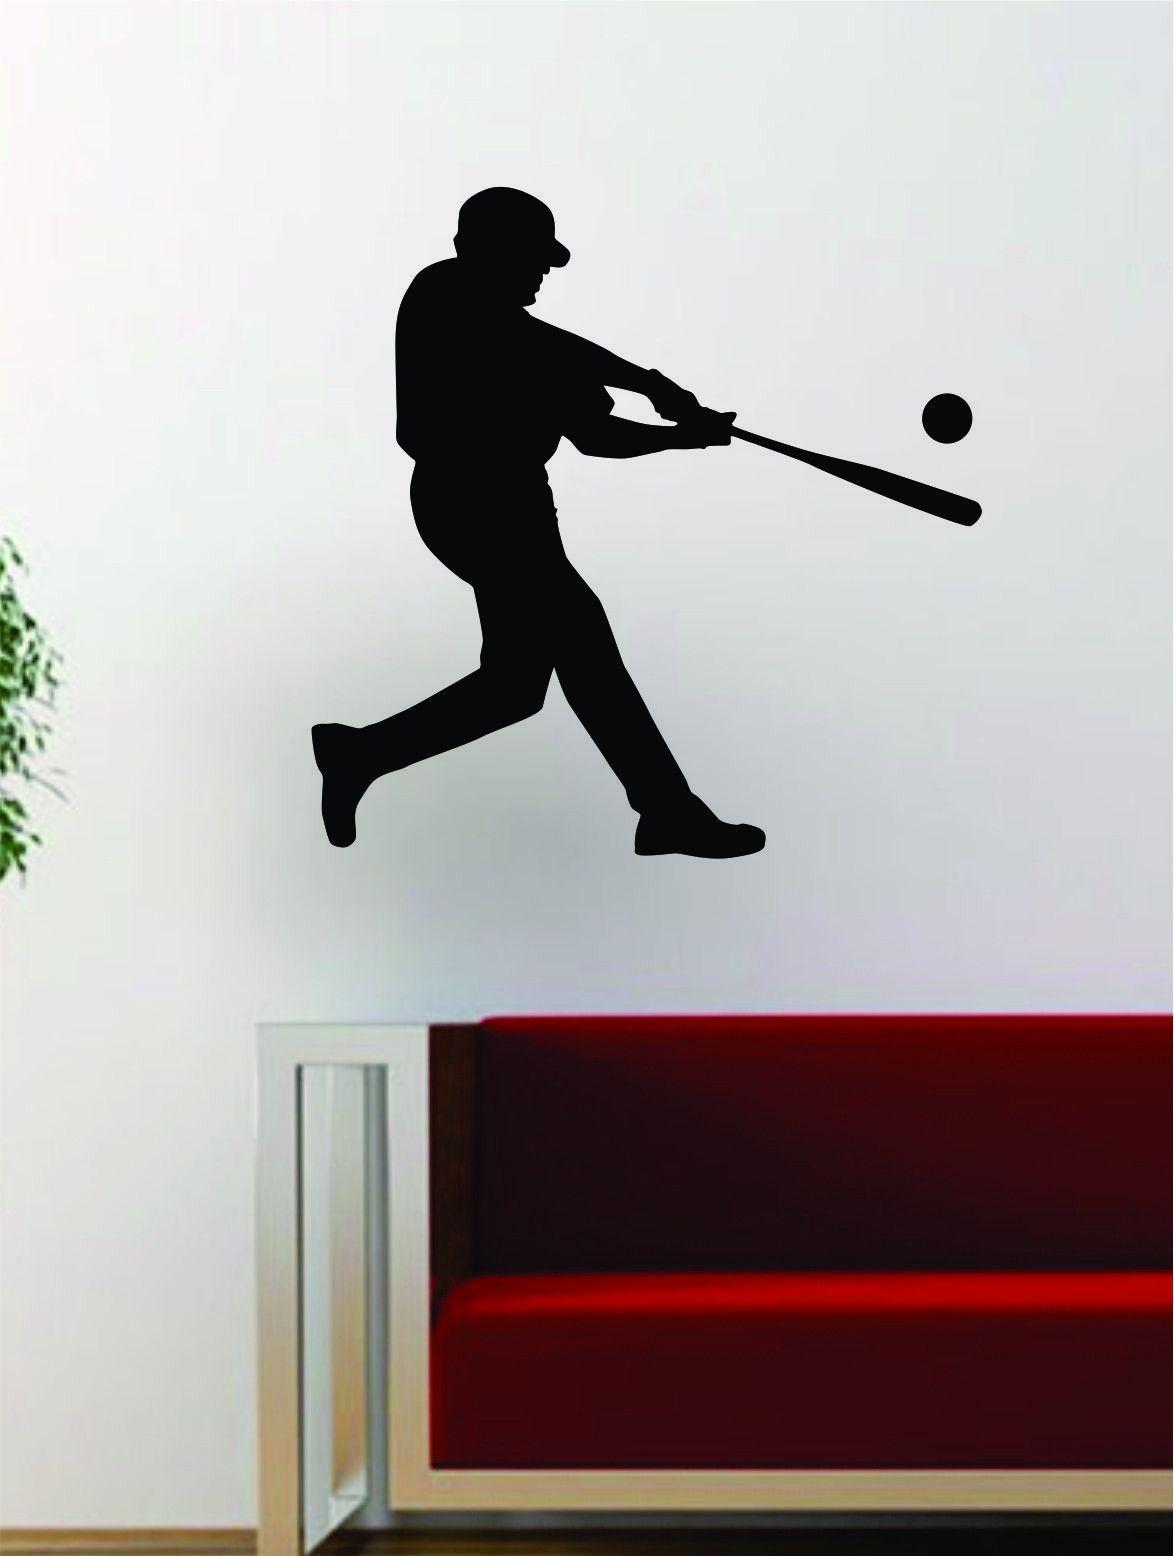 Baseball Player V Batter Home Run Decal Wall Vinyl Art Sticker - Vinyl vinyl wall decals baseball